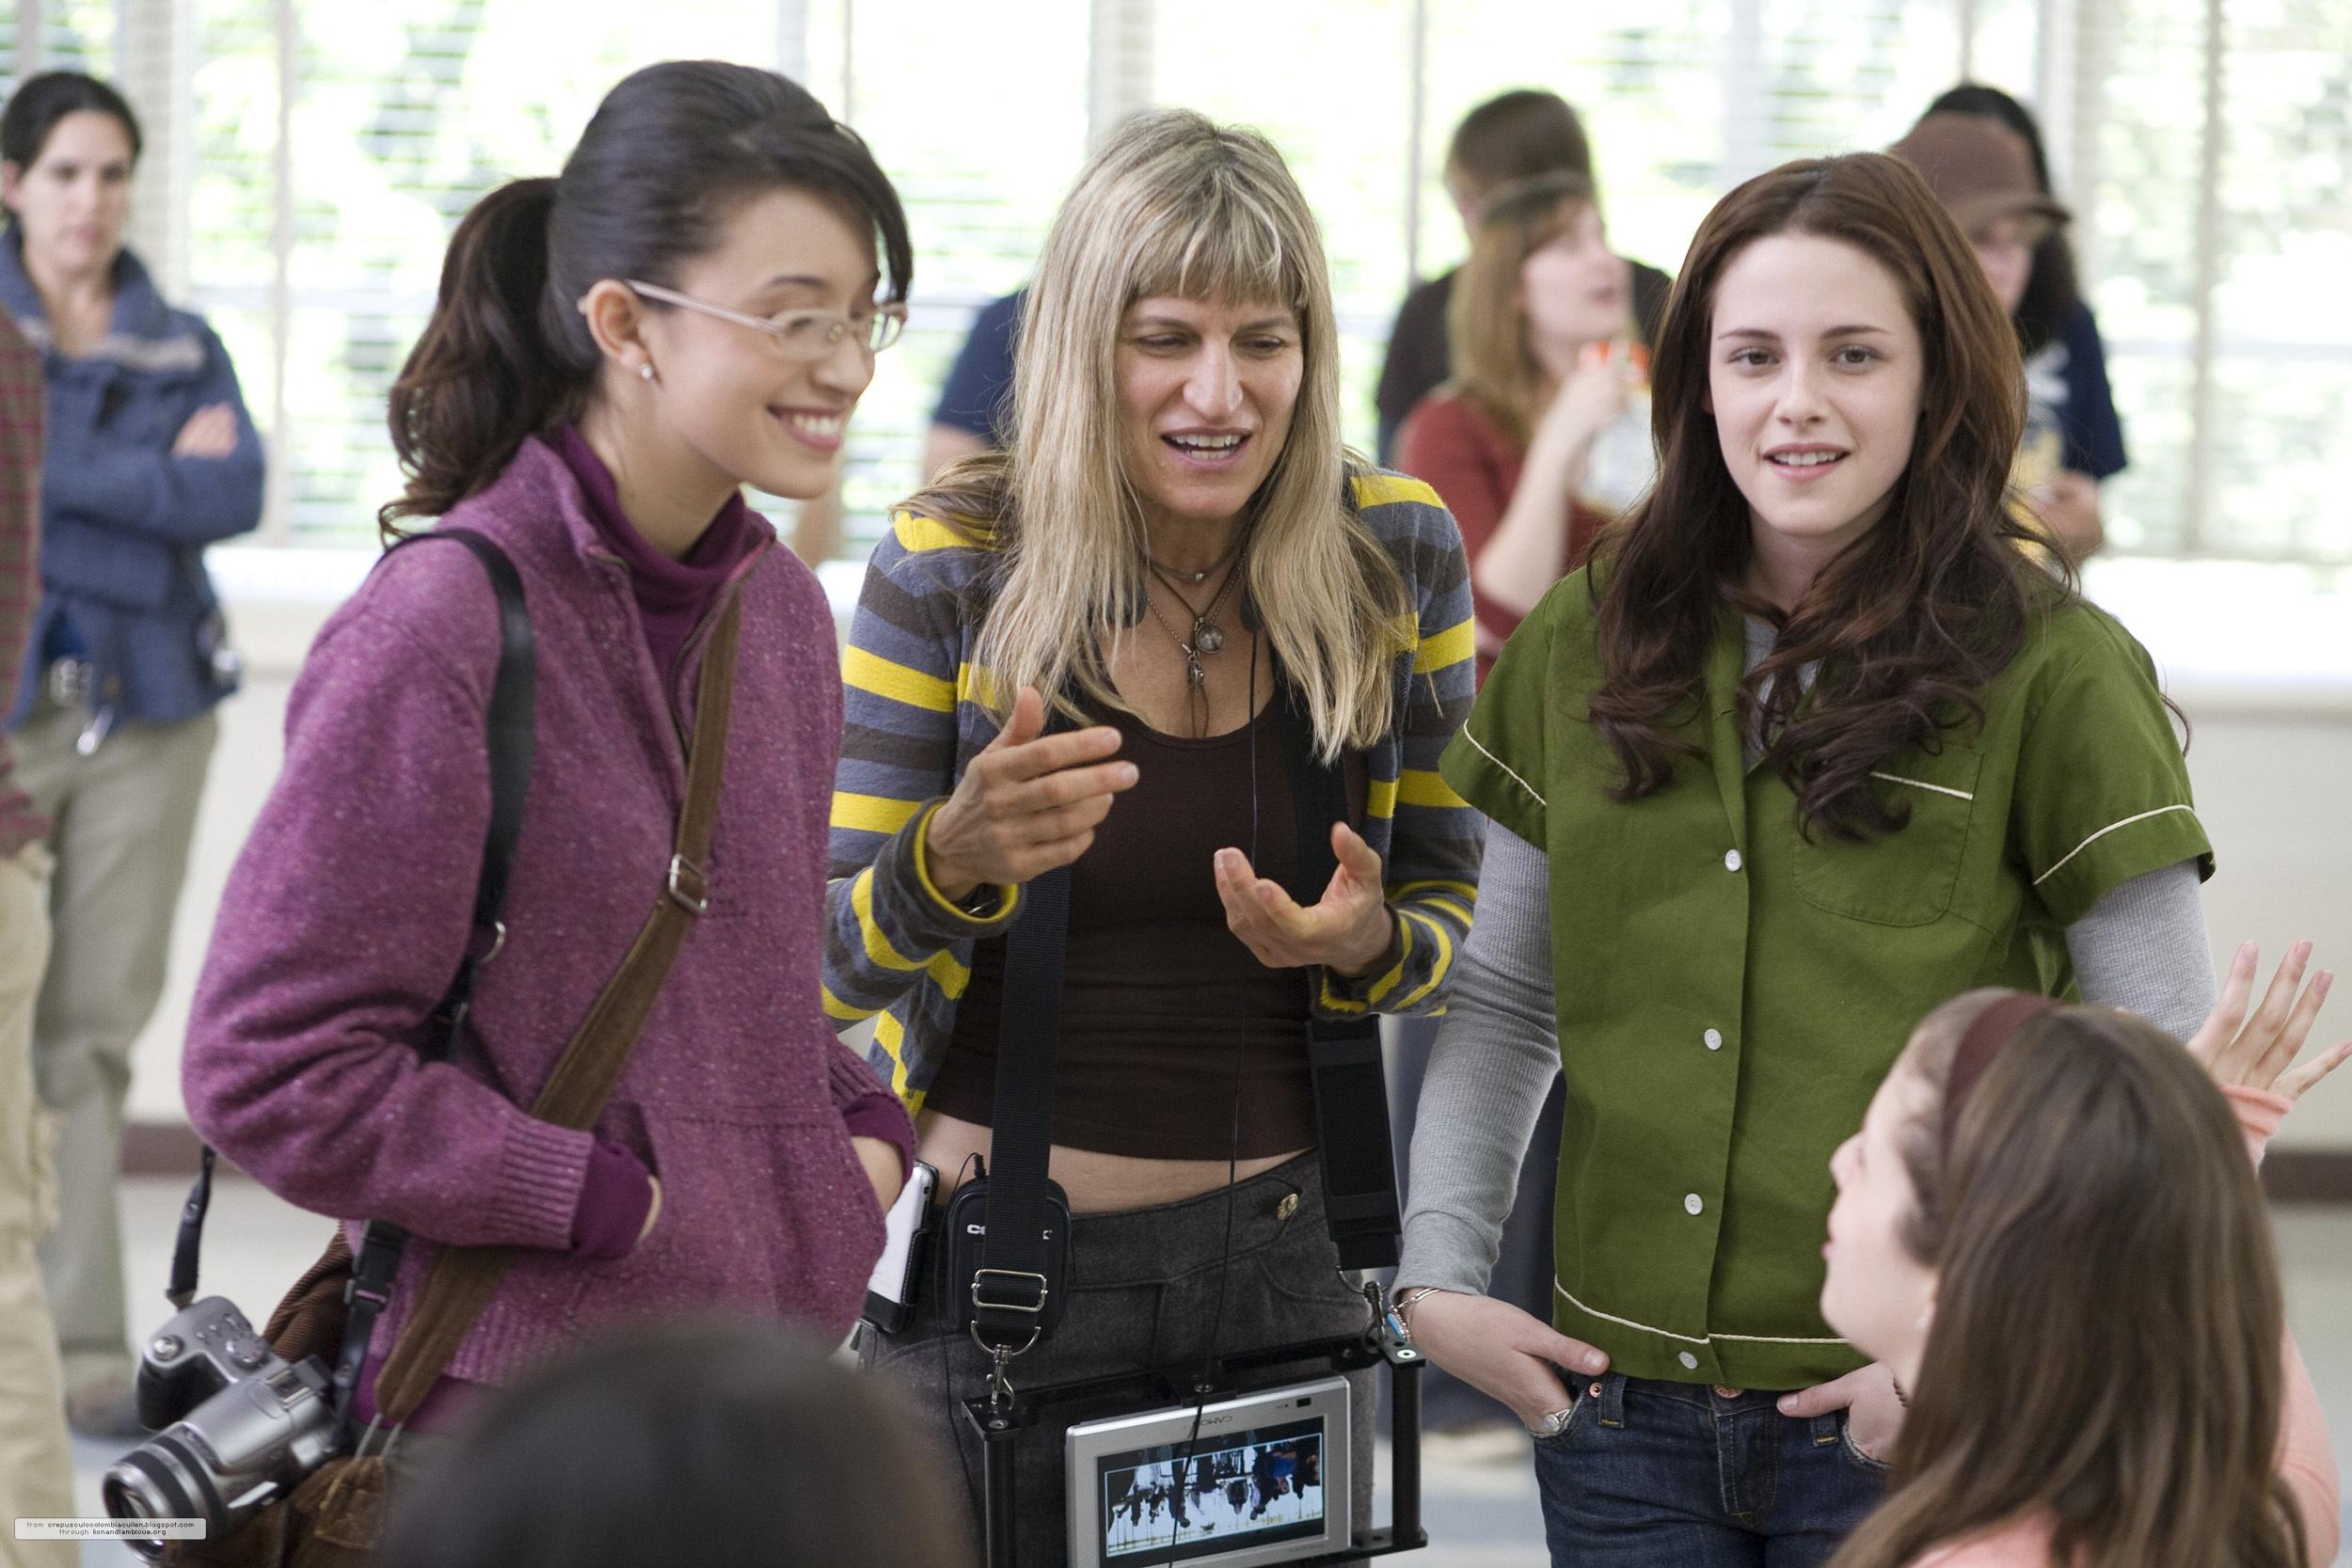 Twilight (2008) Behind the Scenes